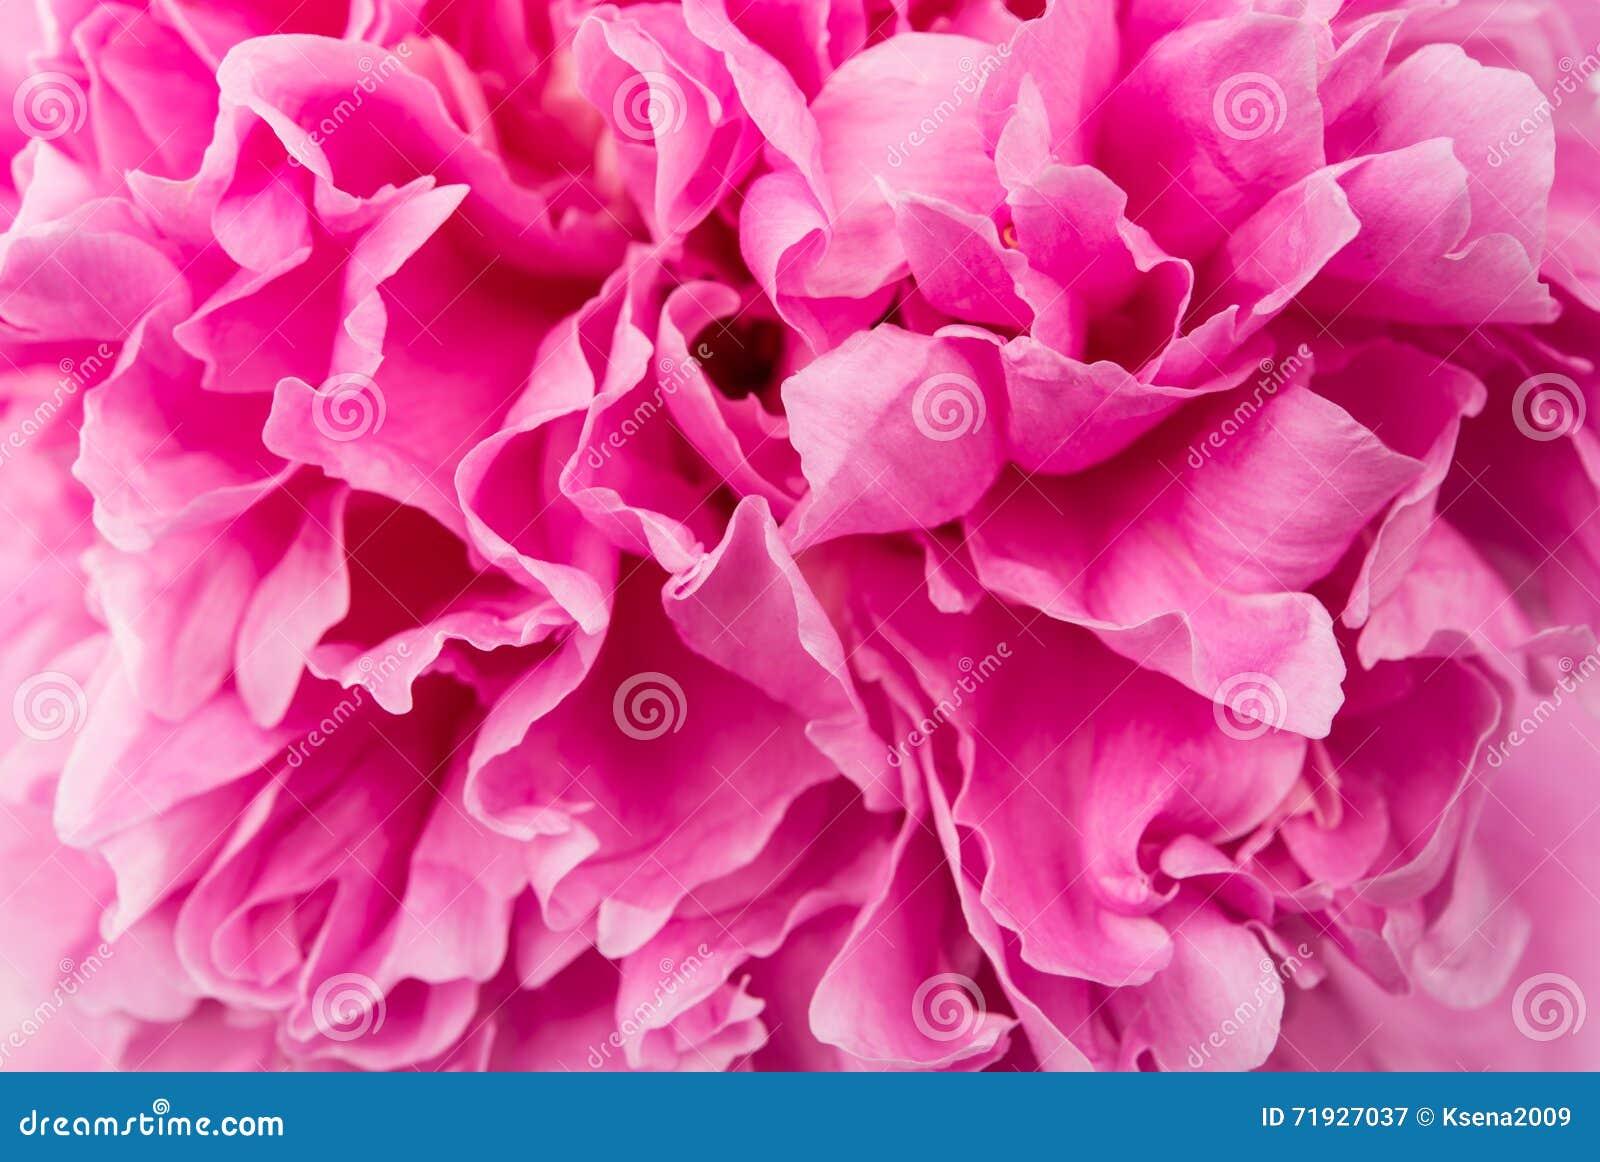 Крупный план красивого розового пиона